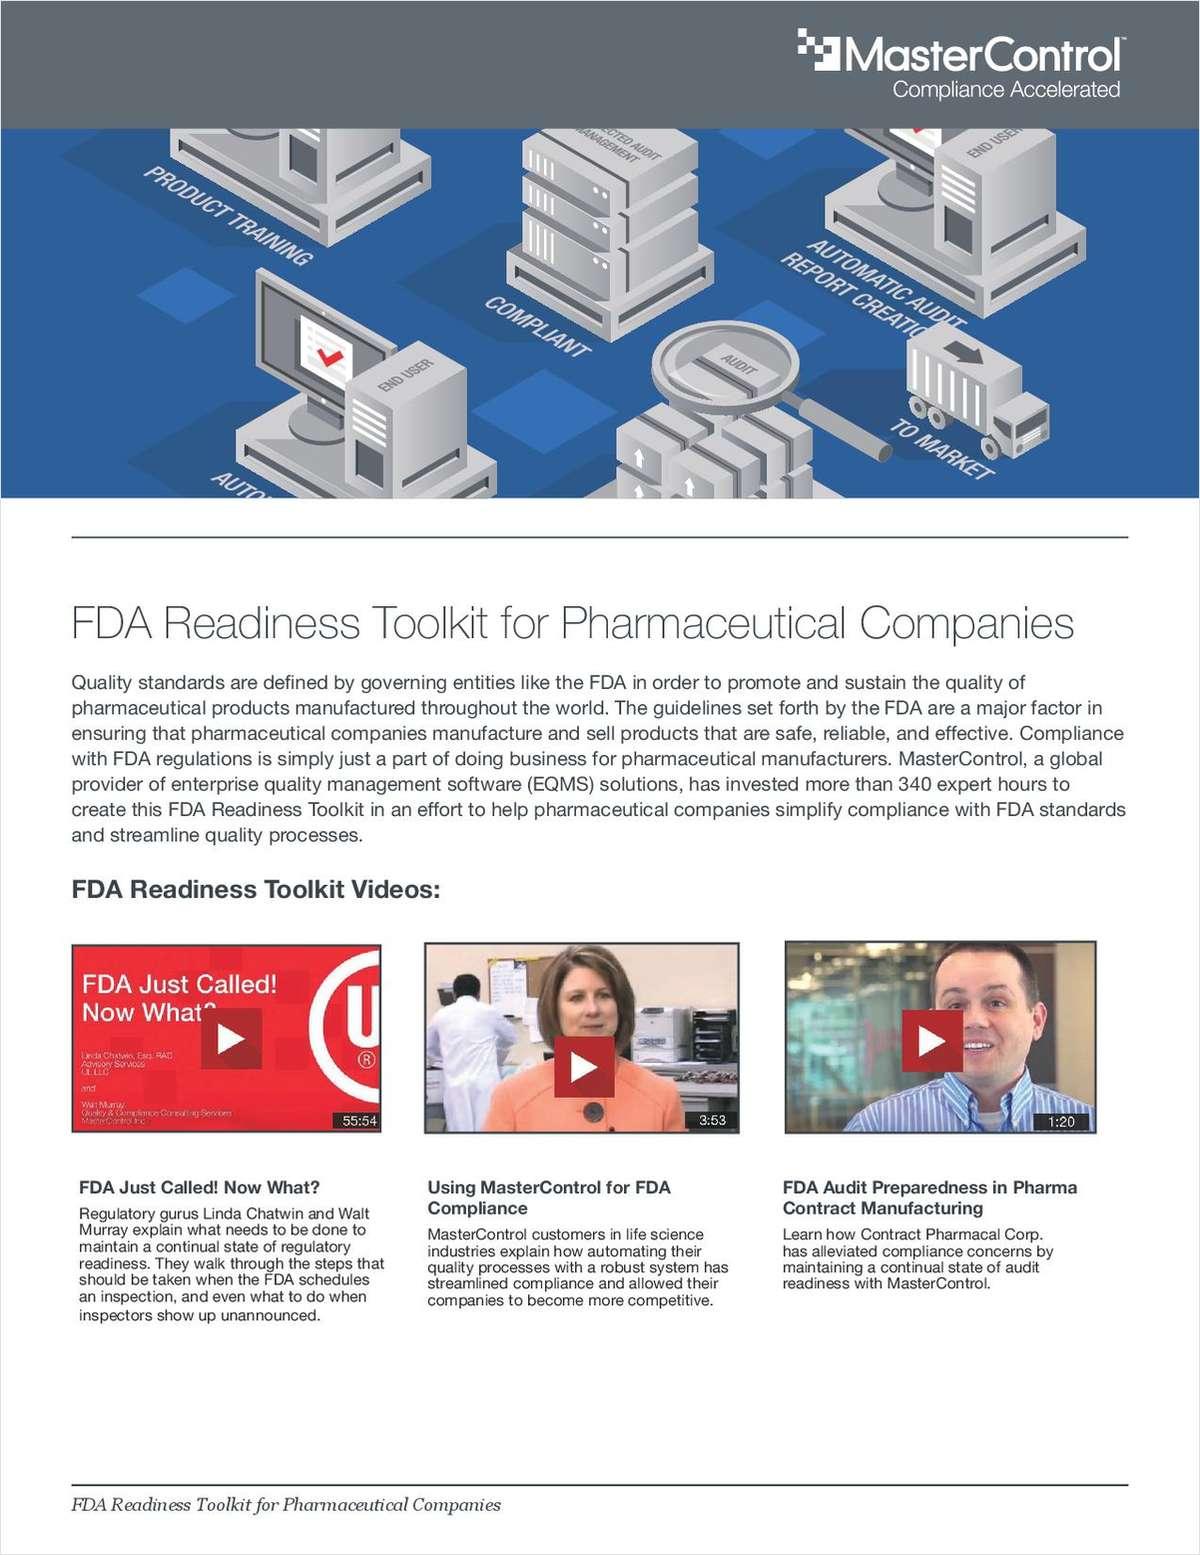 FDA Readiness Toolkit for Pharmaceutical Companies